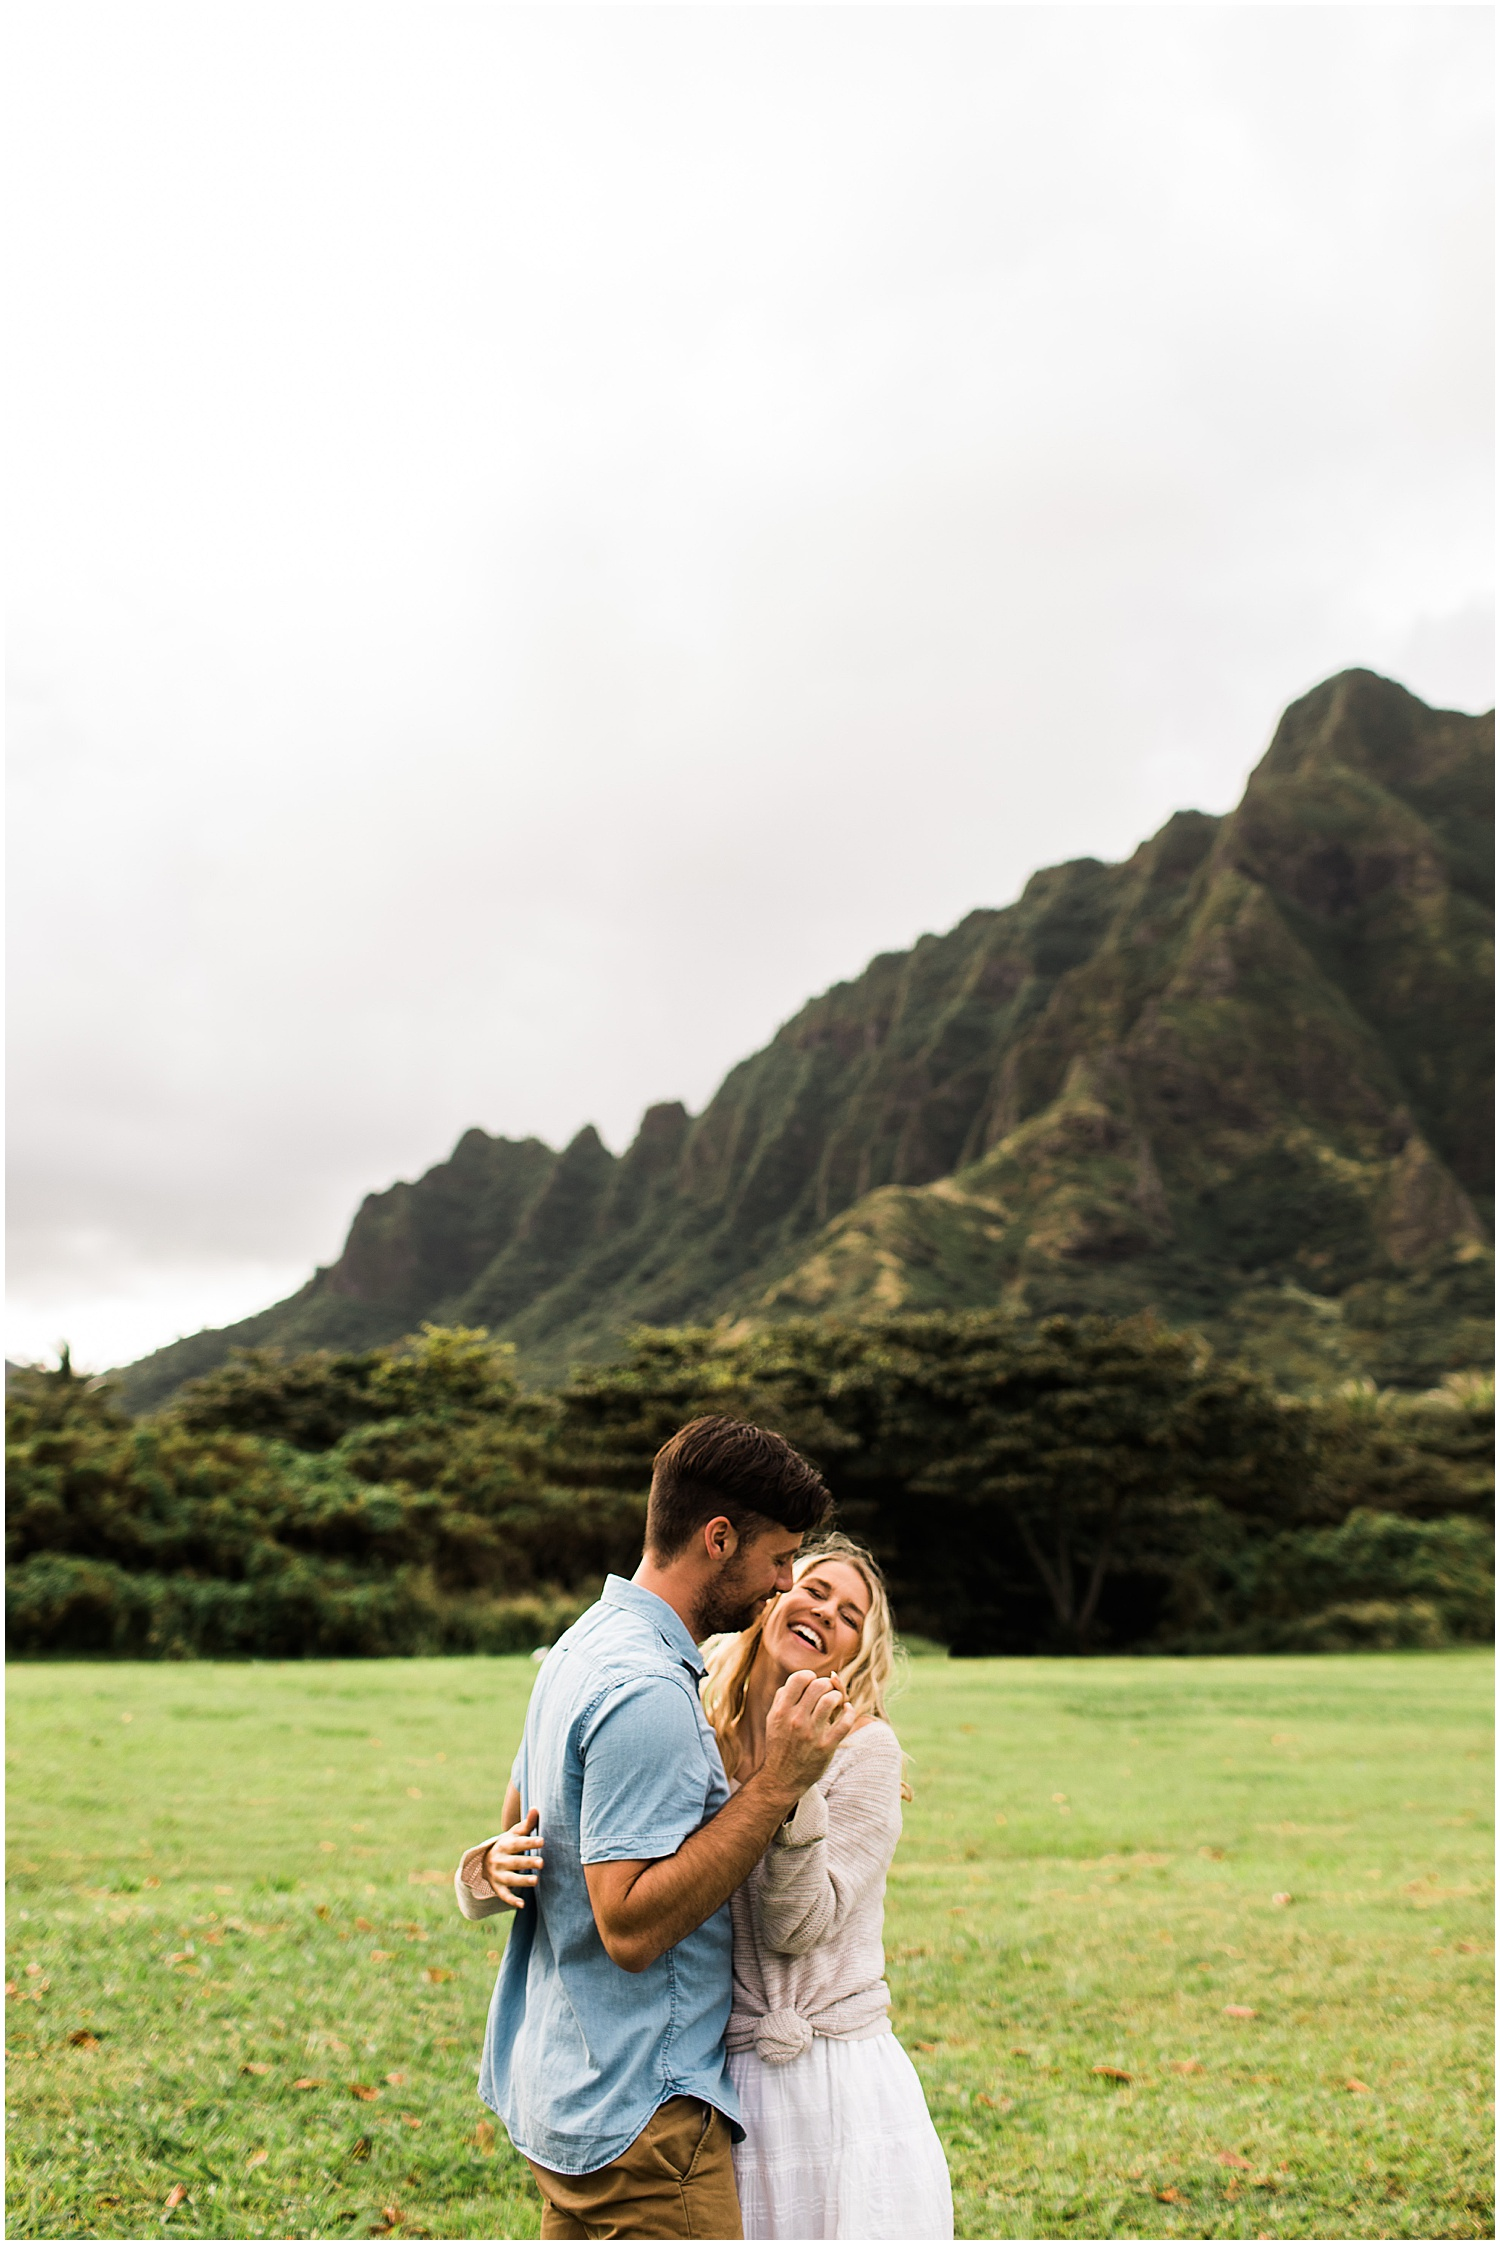 Kualoa Ranch Engagement Session in Oahu, Hawaii